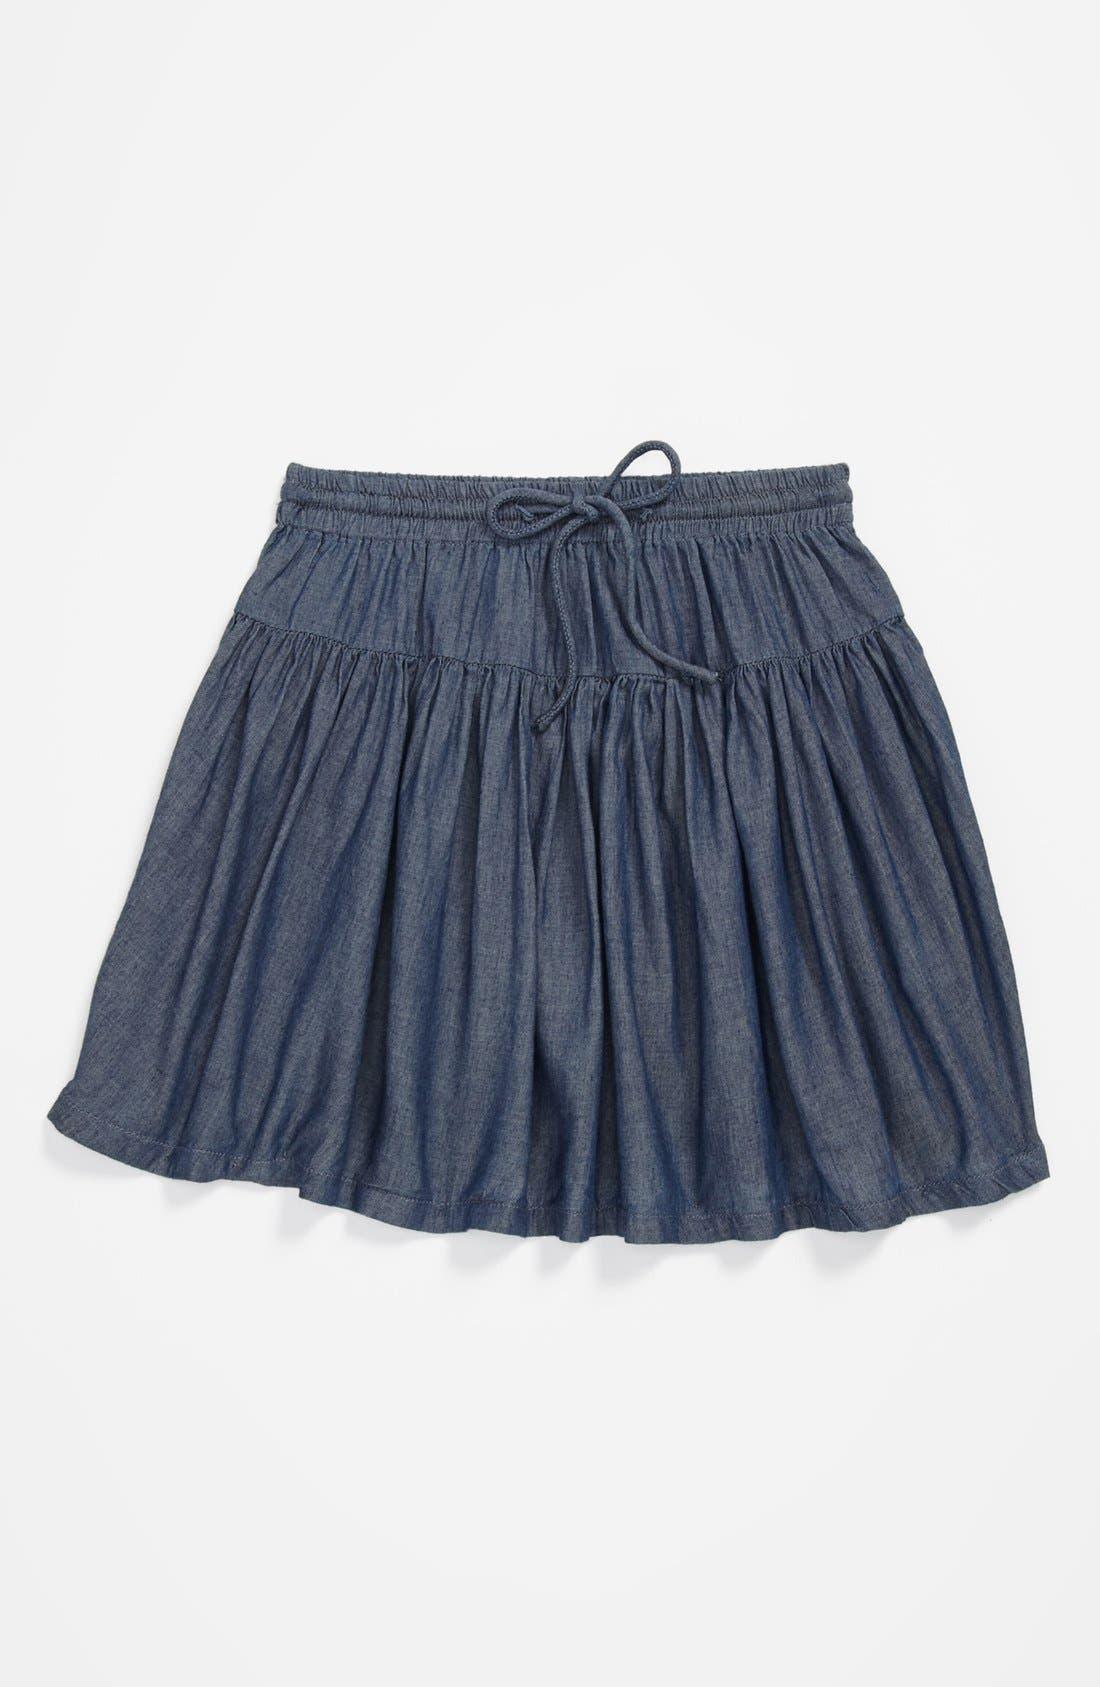 Alternate Image 1 Selected - Peek 'Louise' Skirt (Toddler, Little Girls & Big Girls)